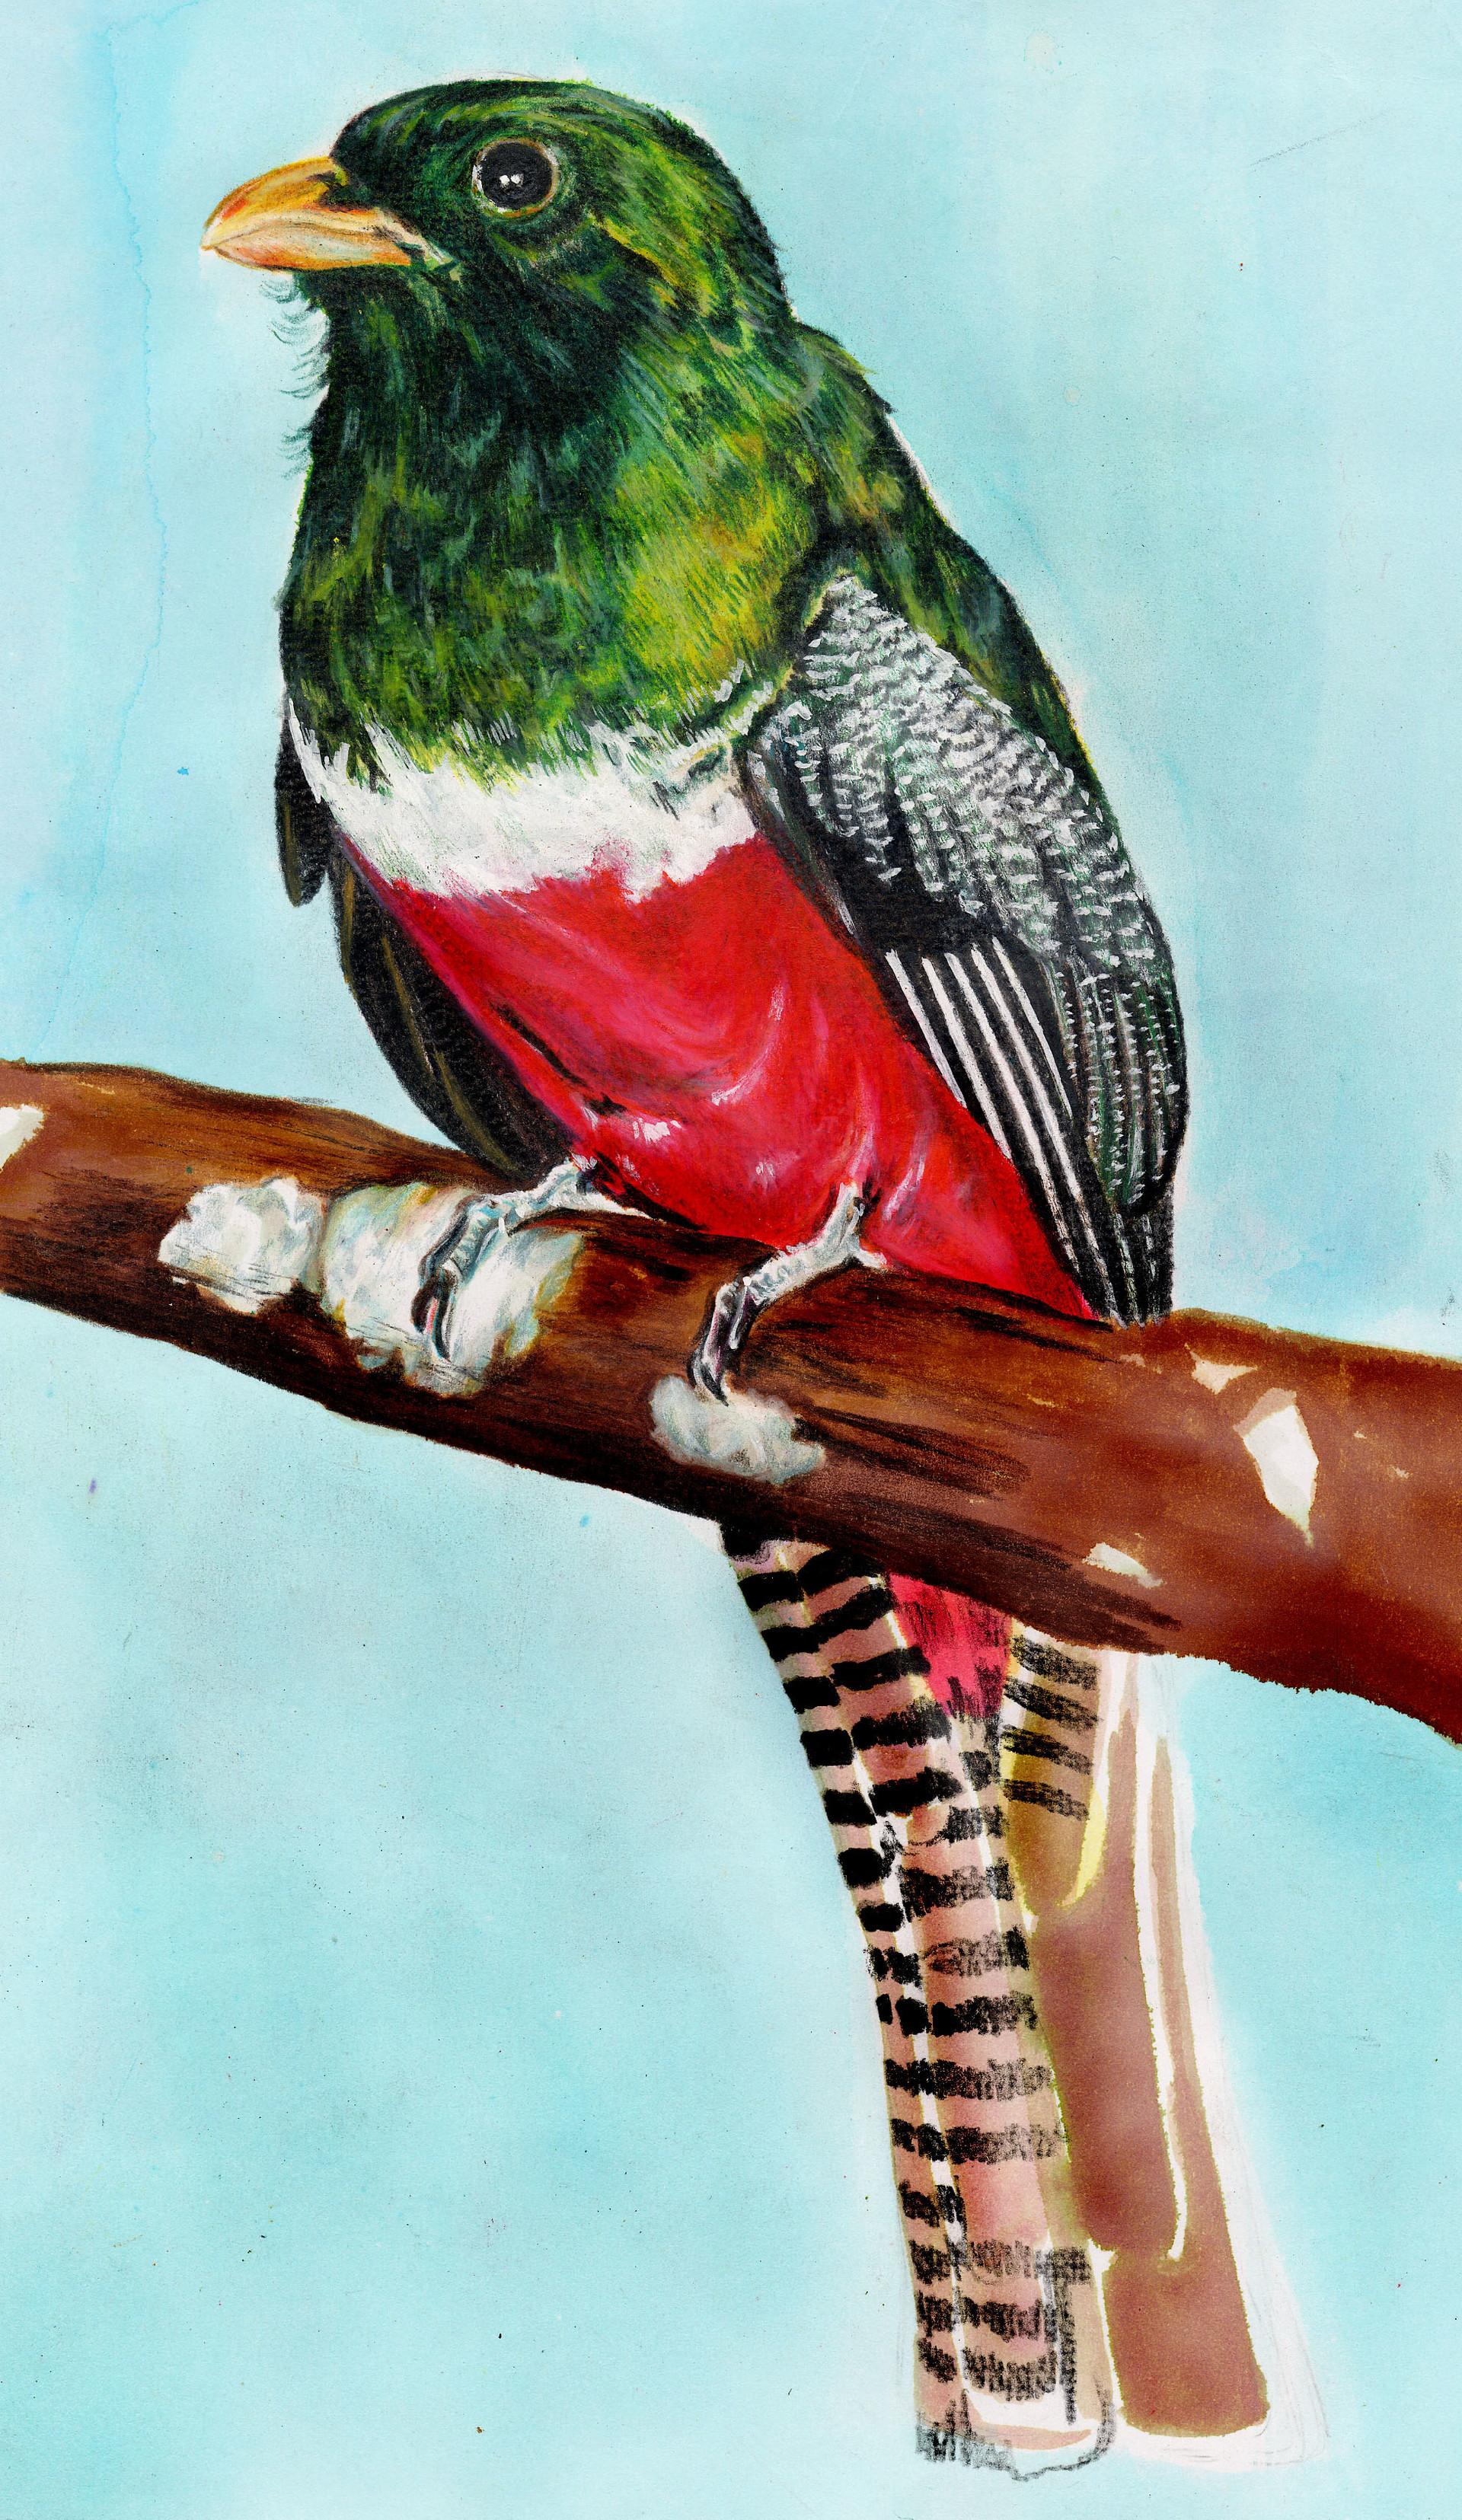 Patricia vasquez de velasco ave